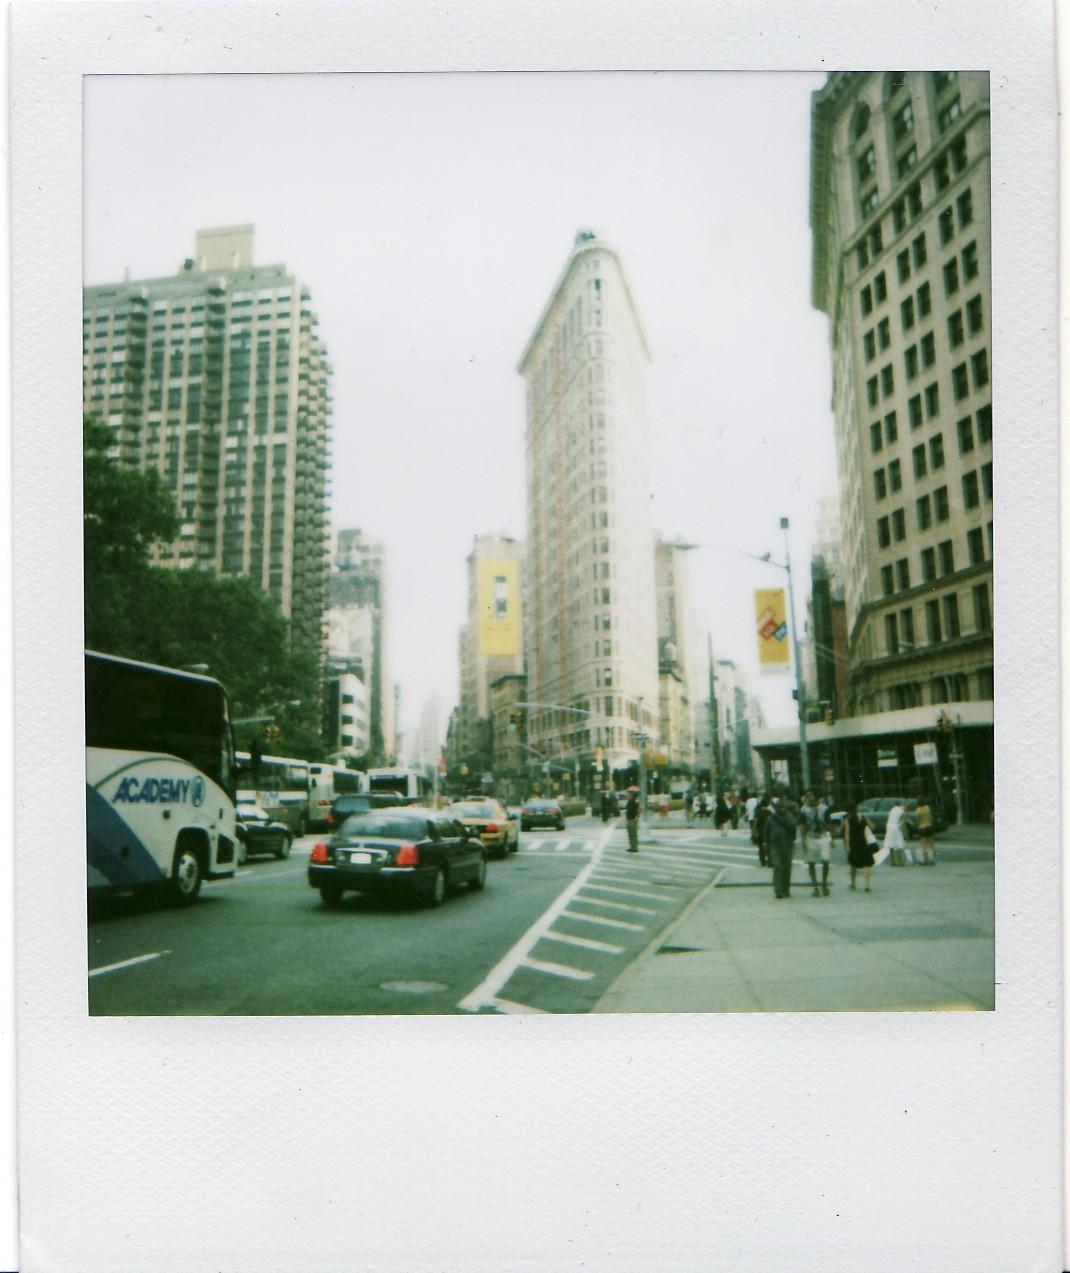 [nyc+street+pola]